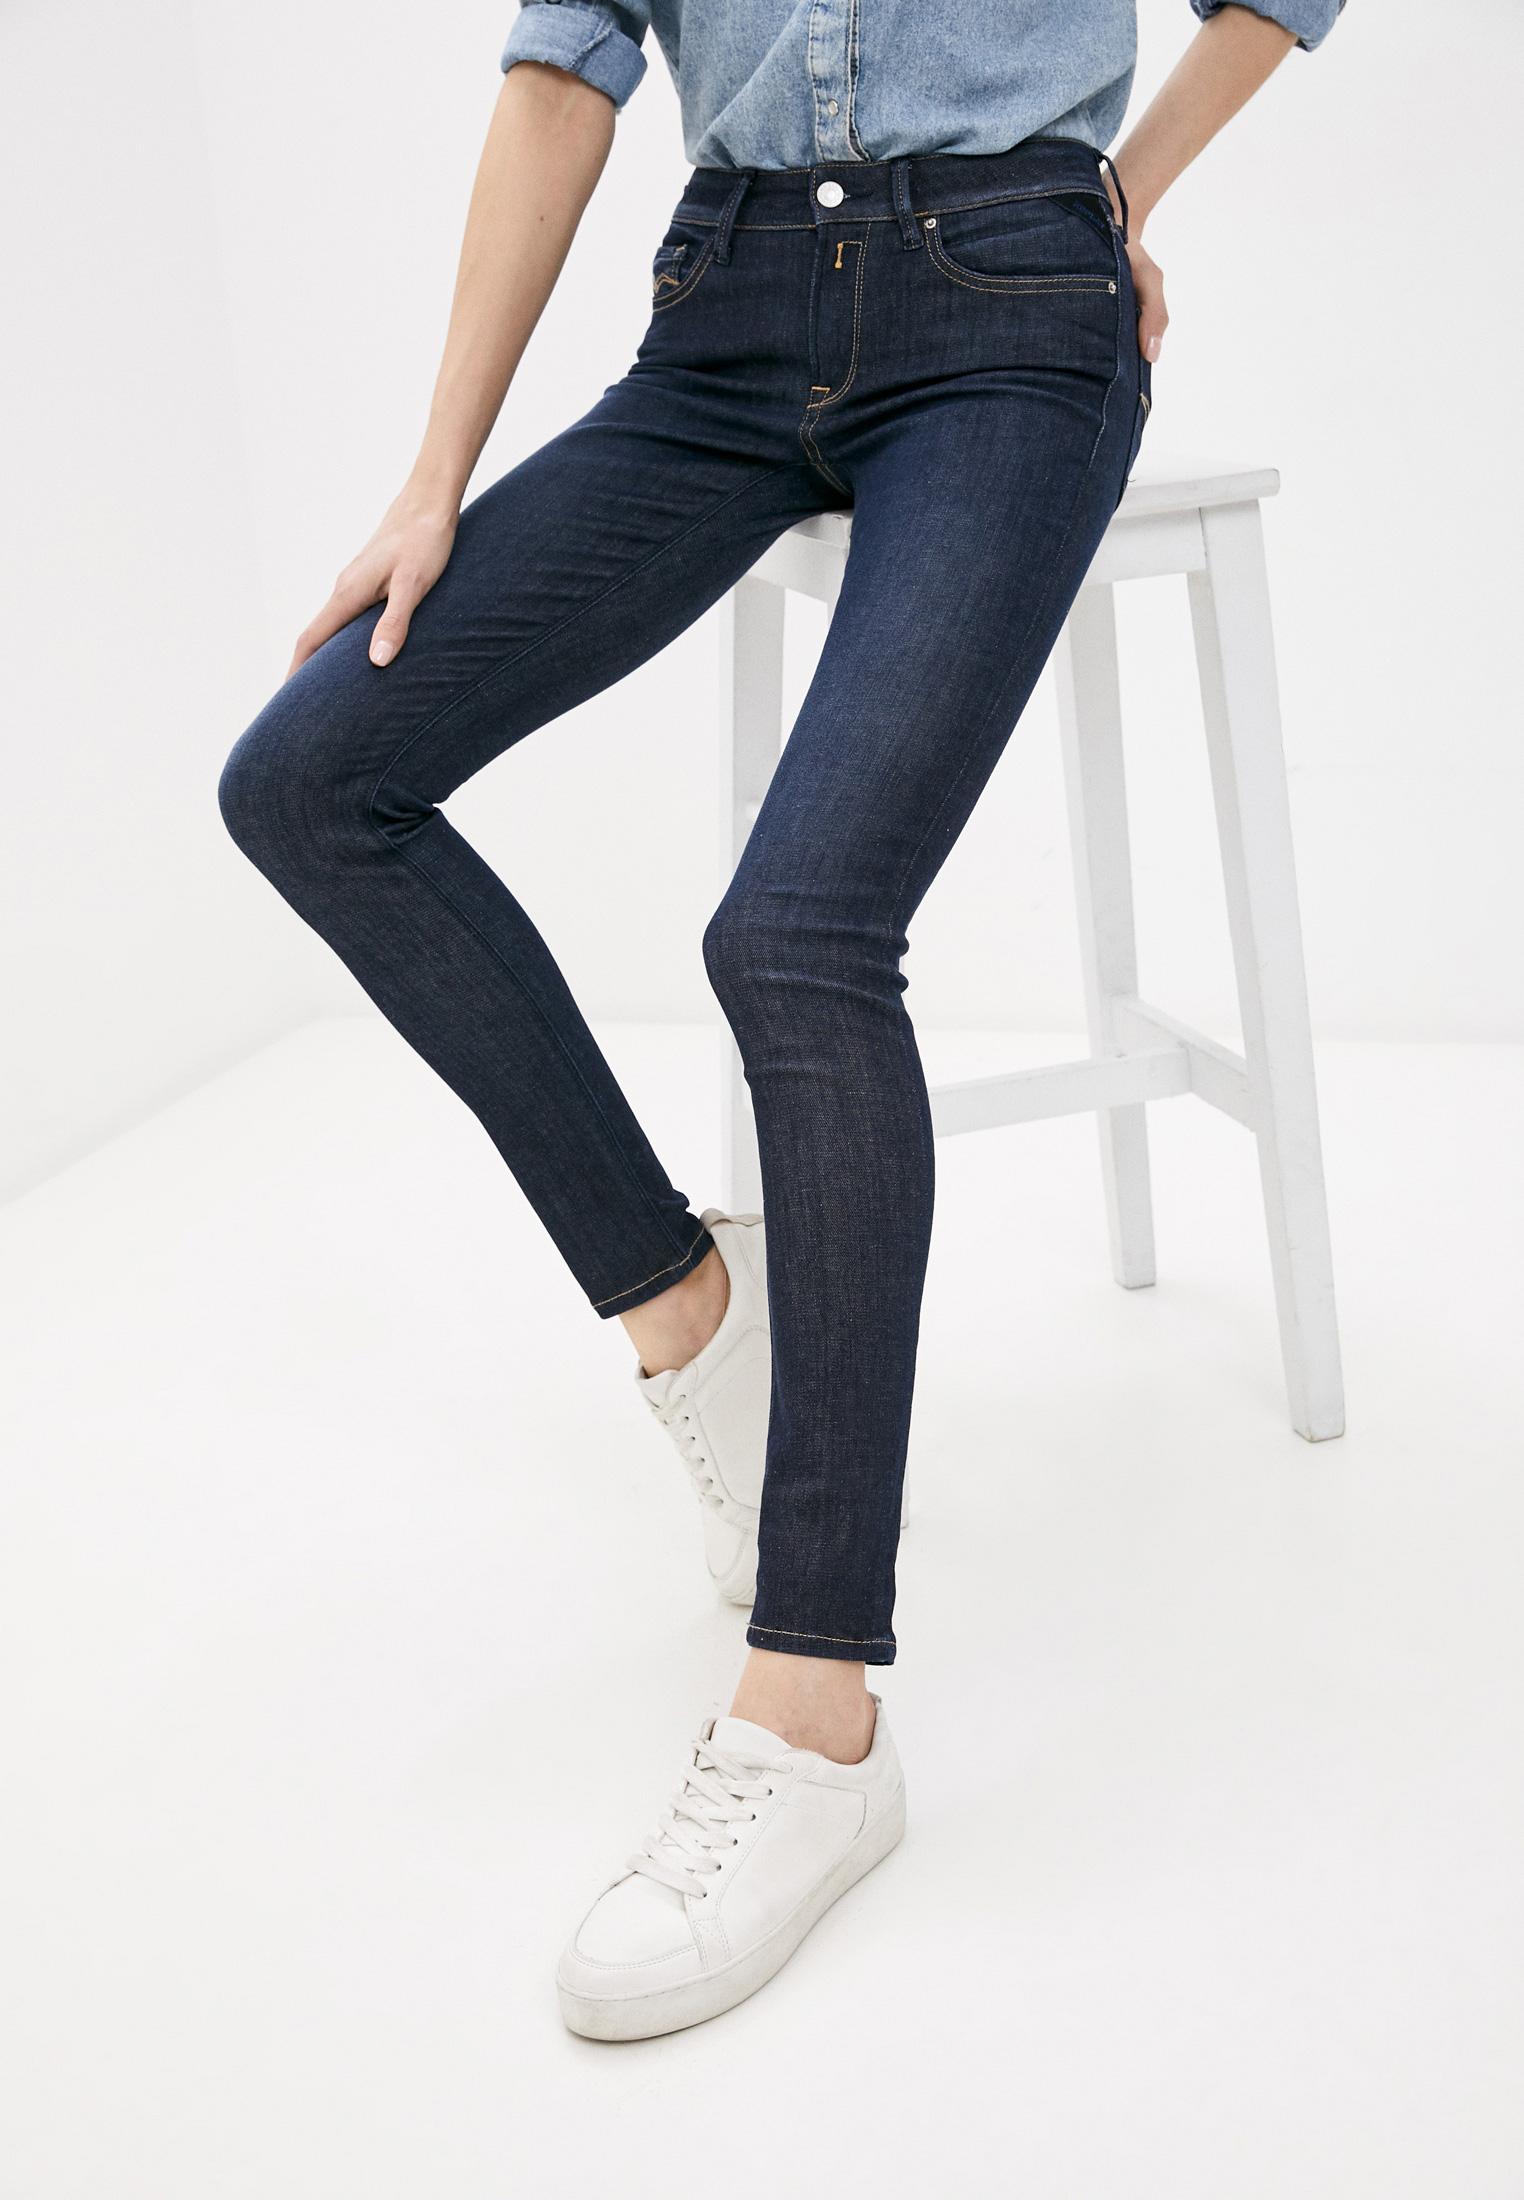 Зауженные джинсы Replay (Реплей) WH689.000.661RI11